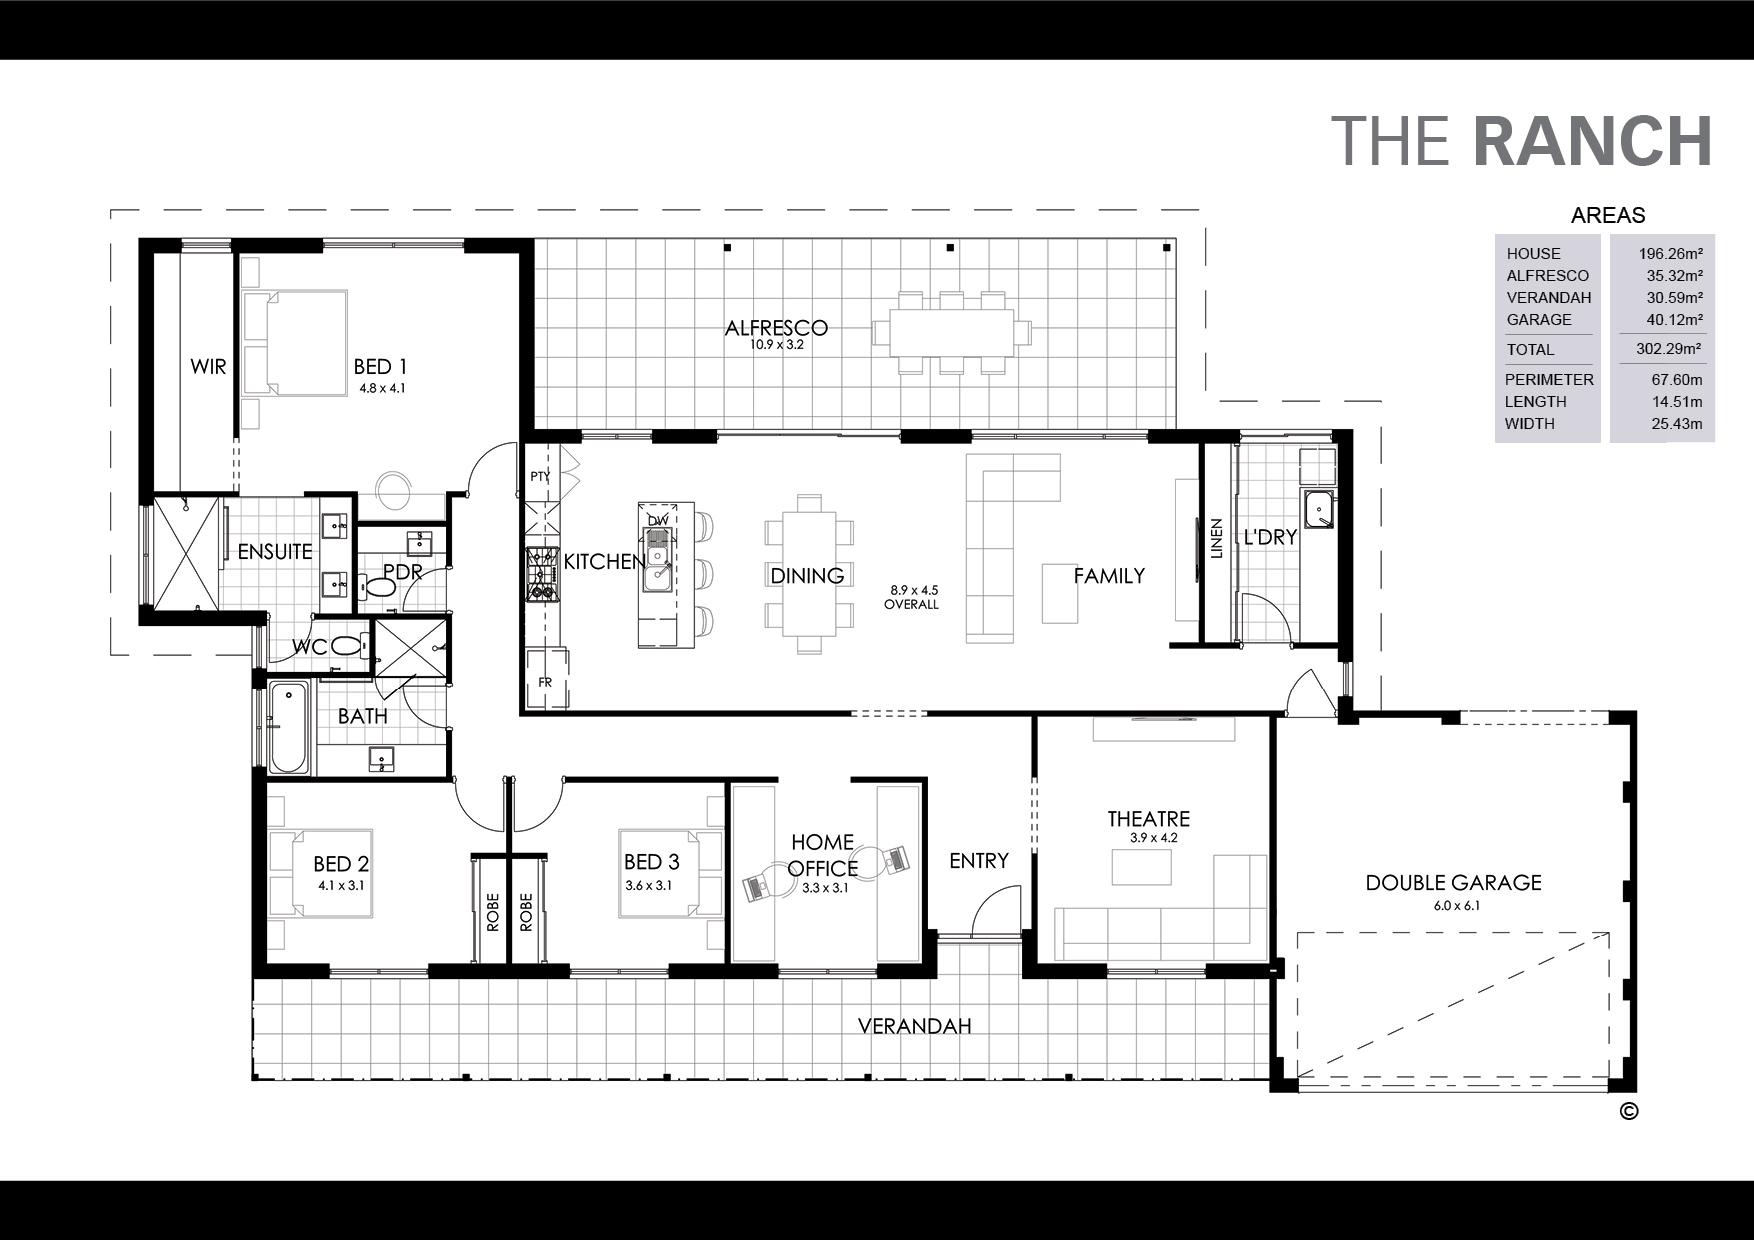 The Ranch Floorplan